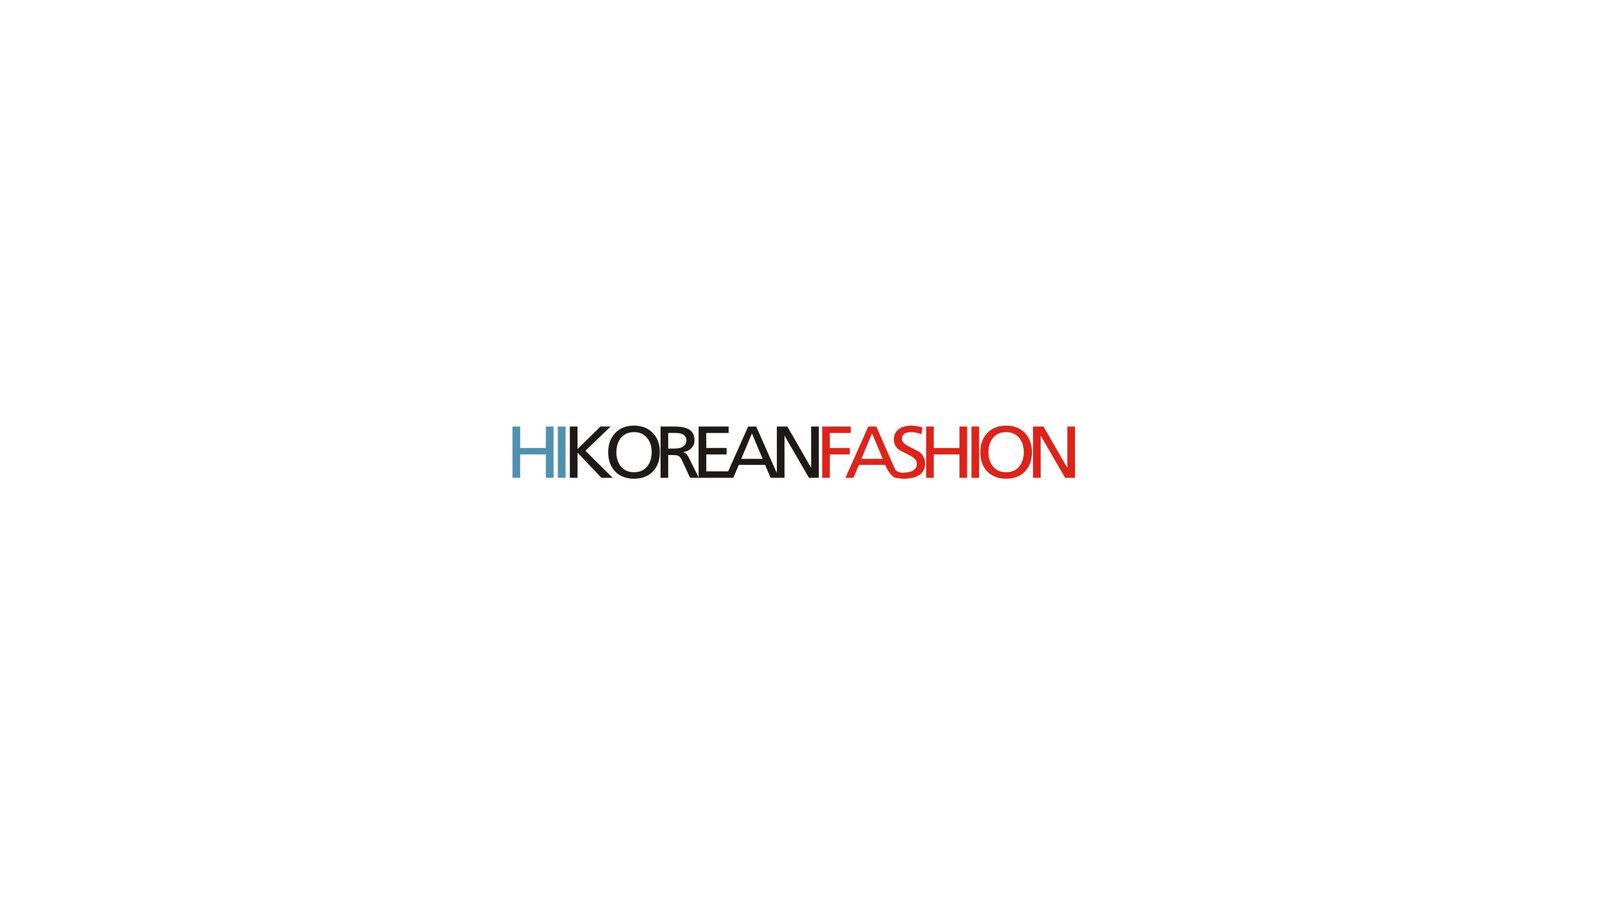 Hi Korean Fashion